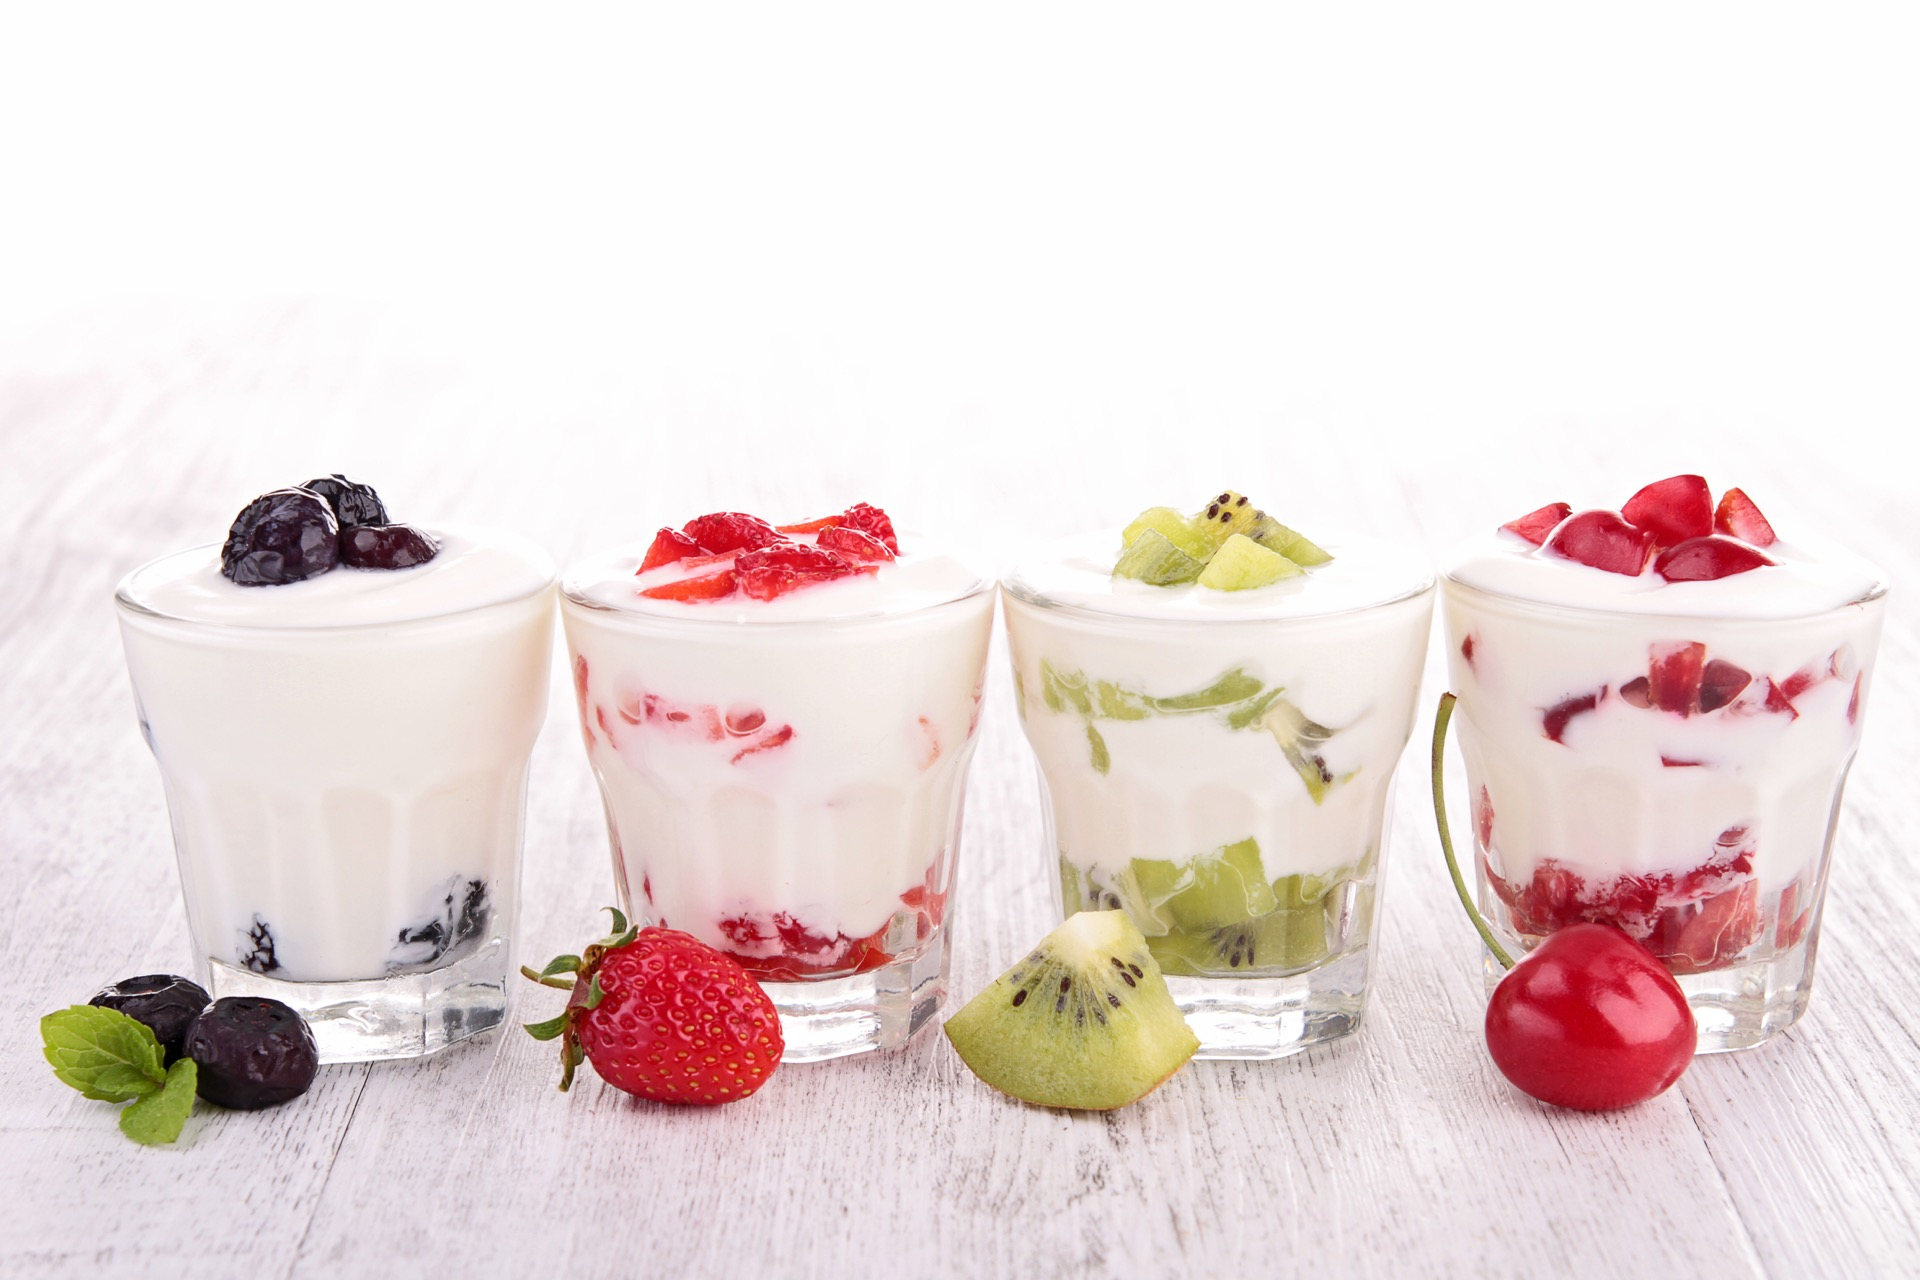 yoghurt mat for økt sexlyst